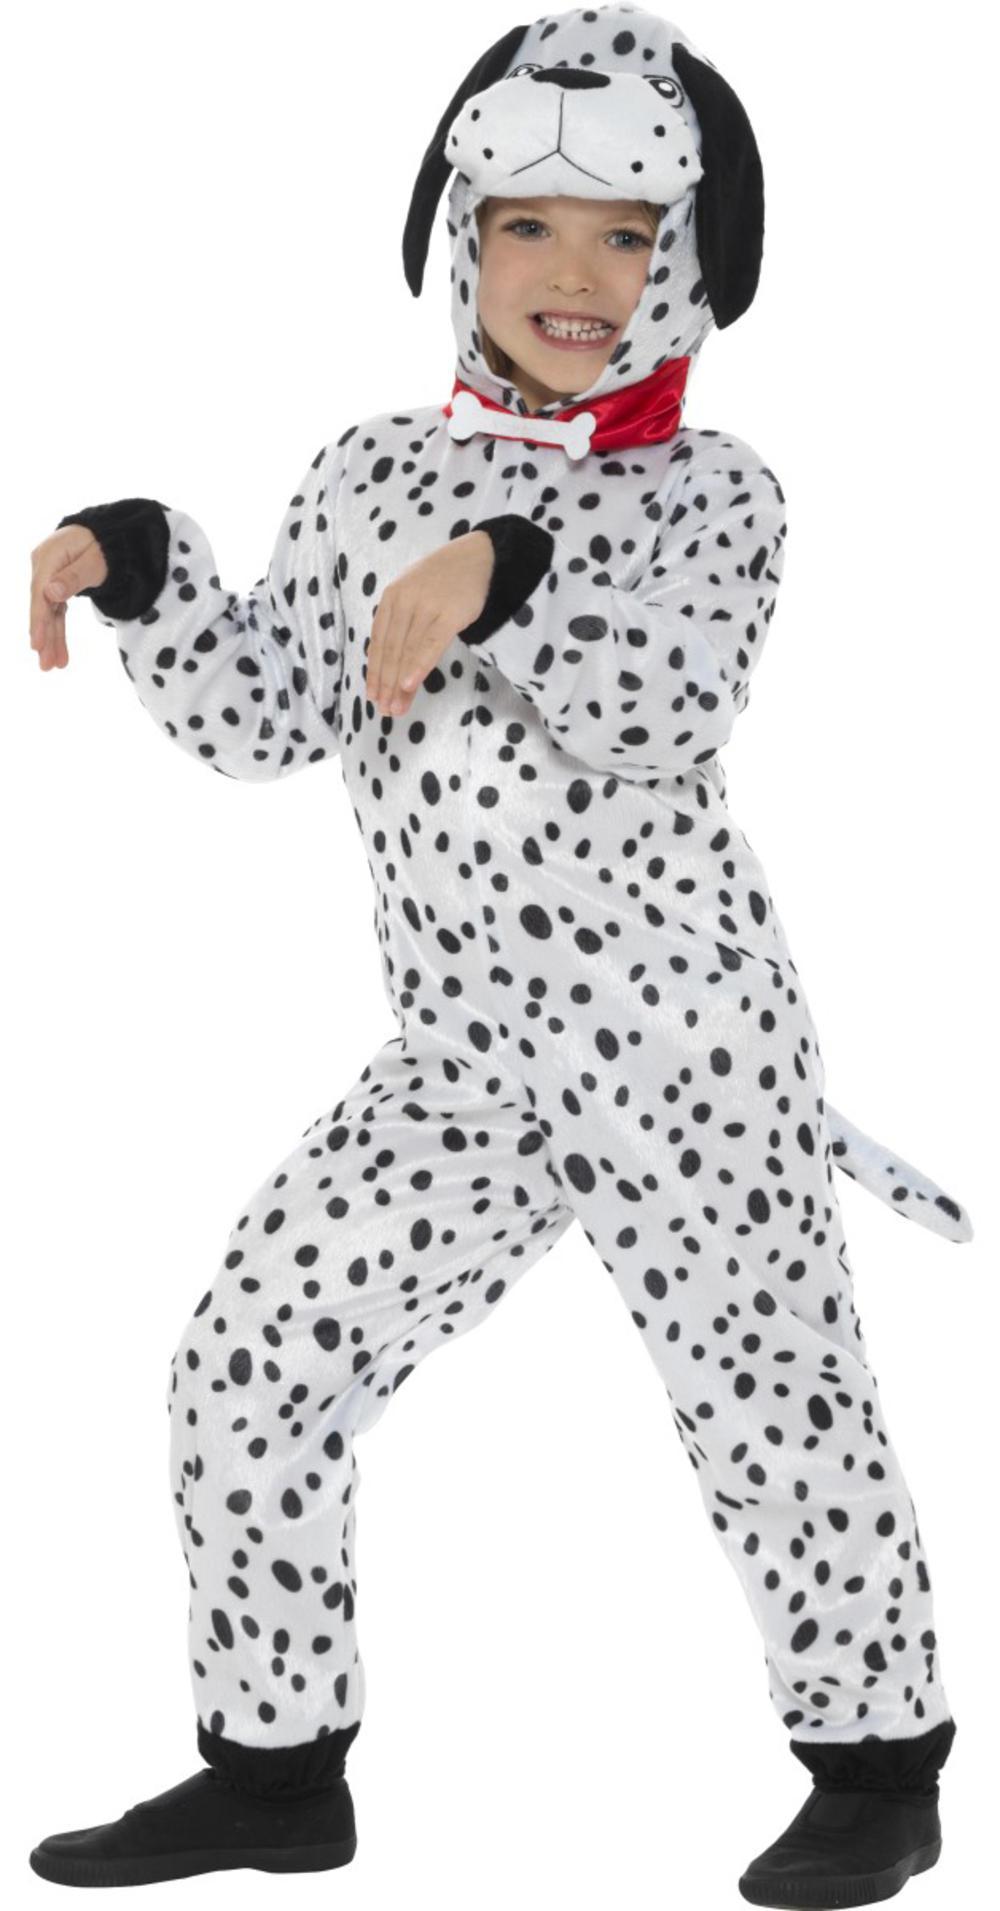 Dalmatian Kids Fancy Dress Dog Puppy Halloween Boys Girls Childrens Costume